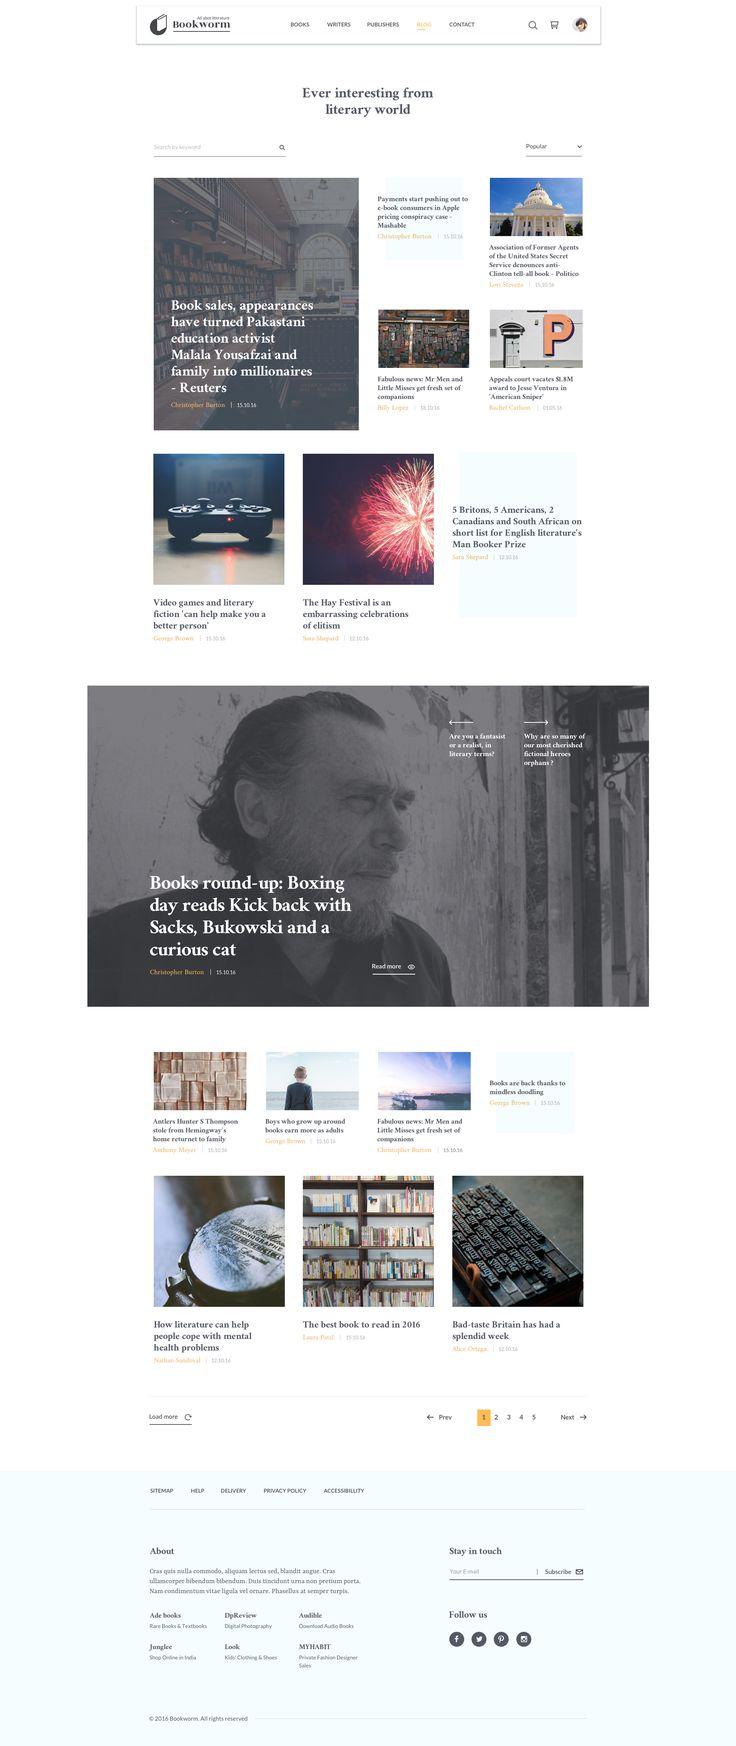 Bookshop desktop hd blog 2